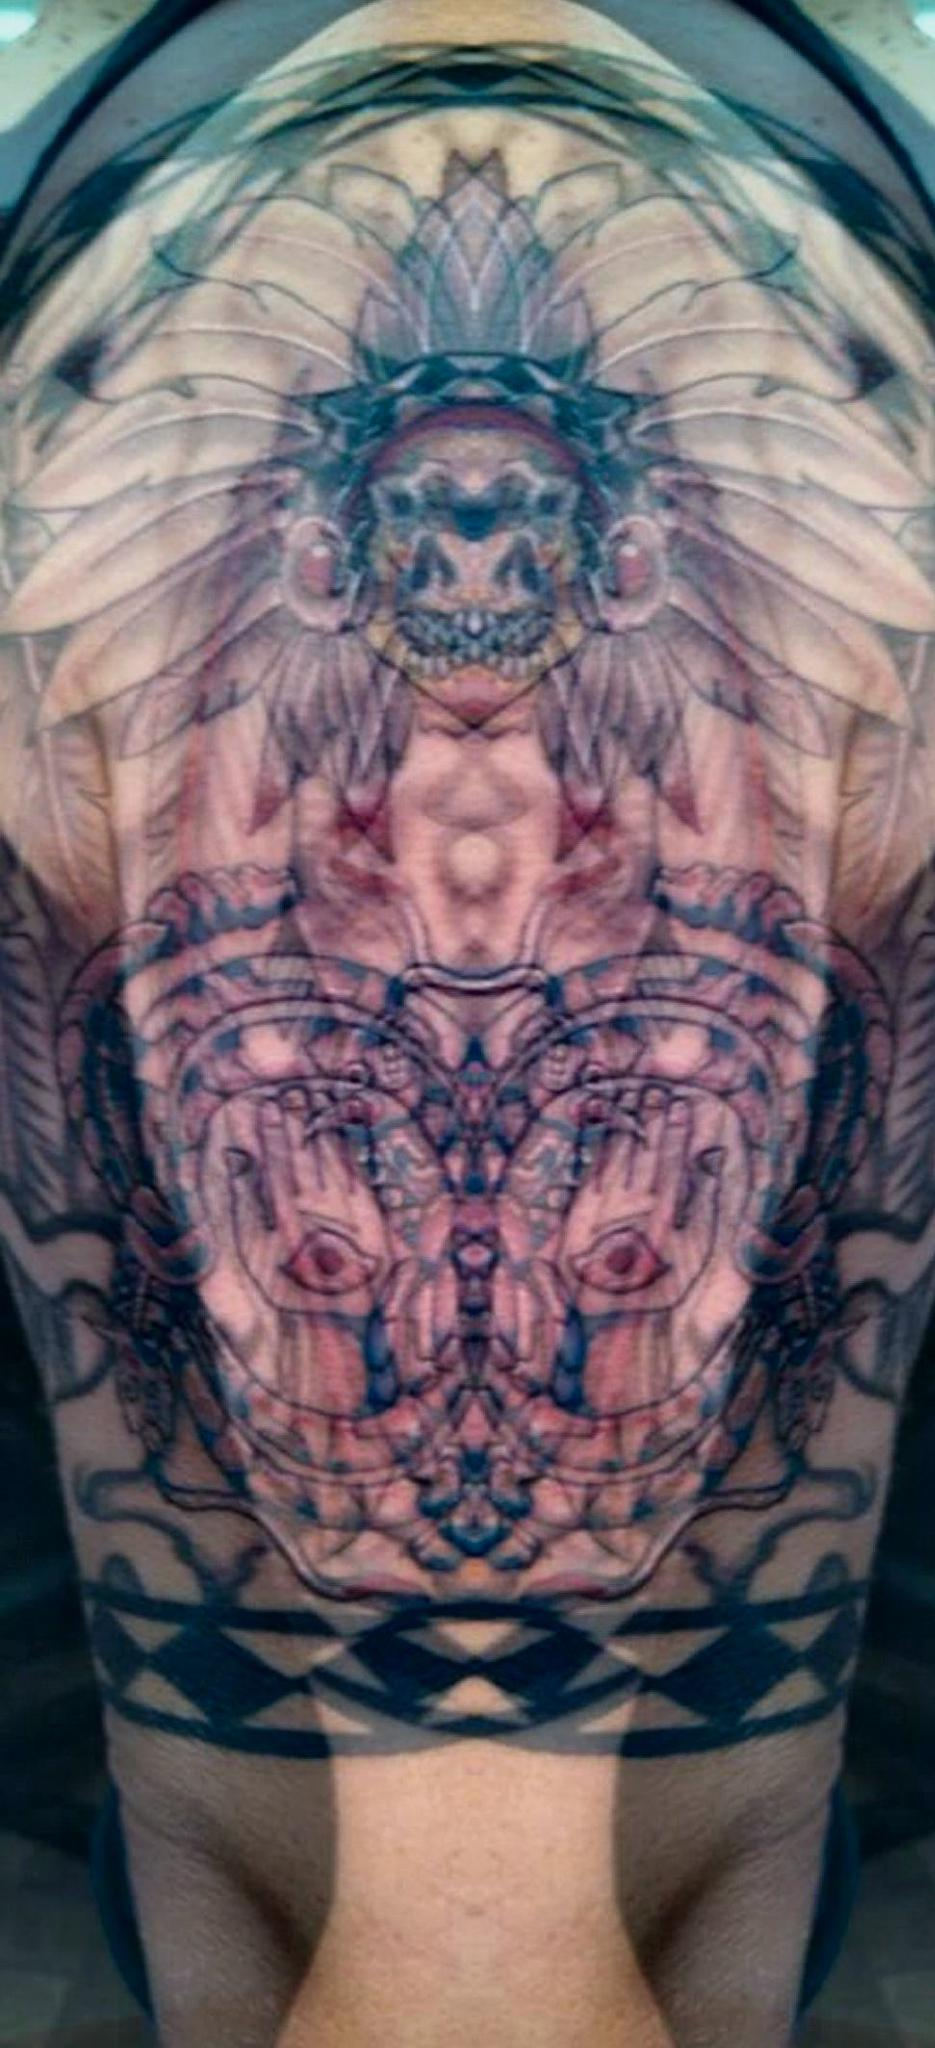 my new sleeve  by John Longbow